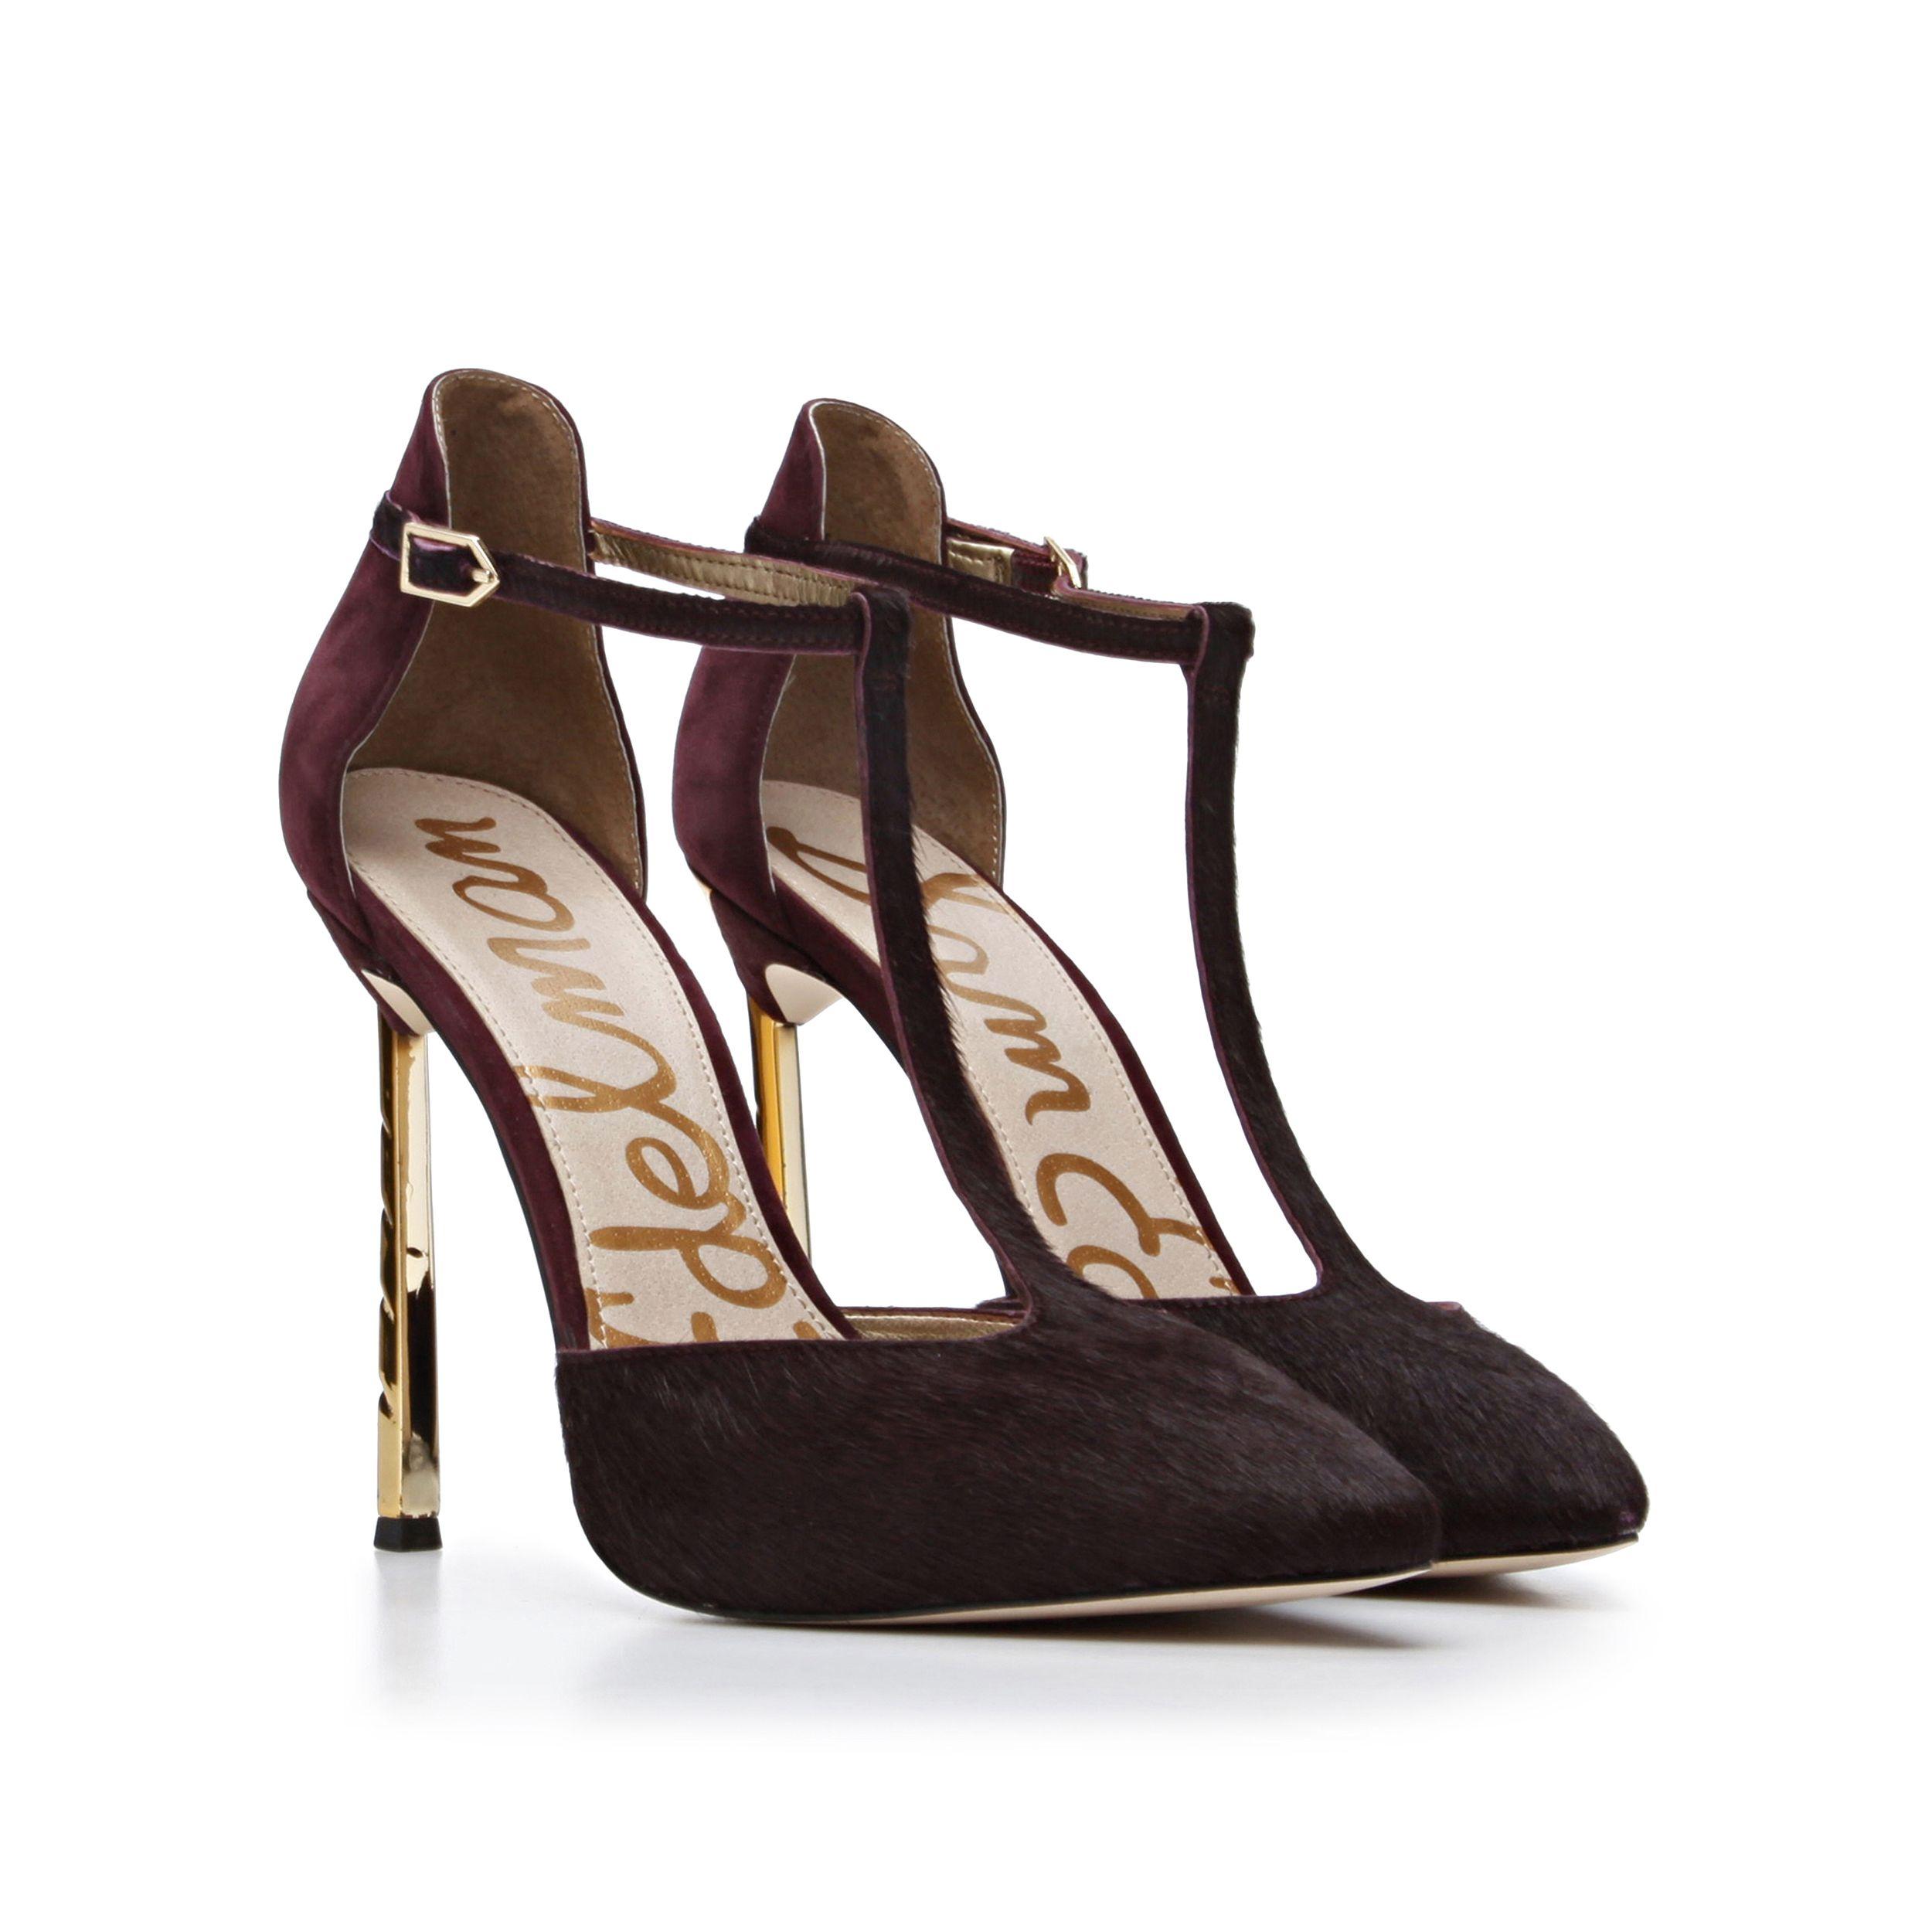 d4e535eea7f534 The  Smithfield  heel in Burgundy pony hair